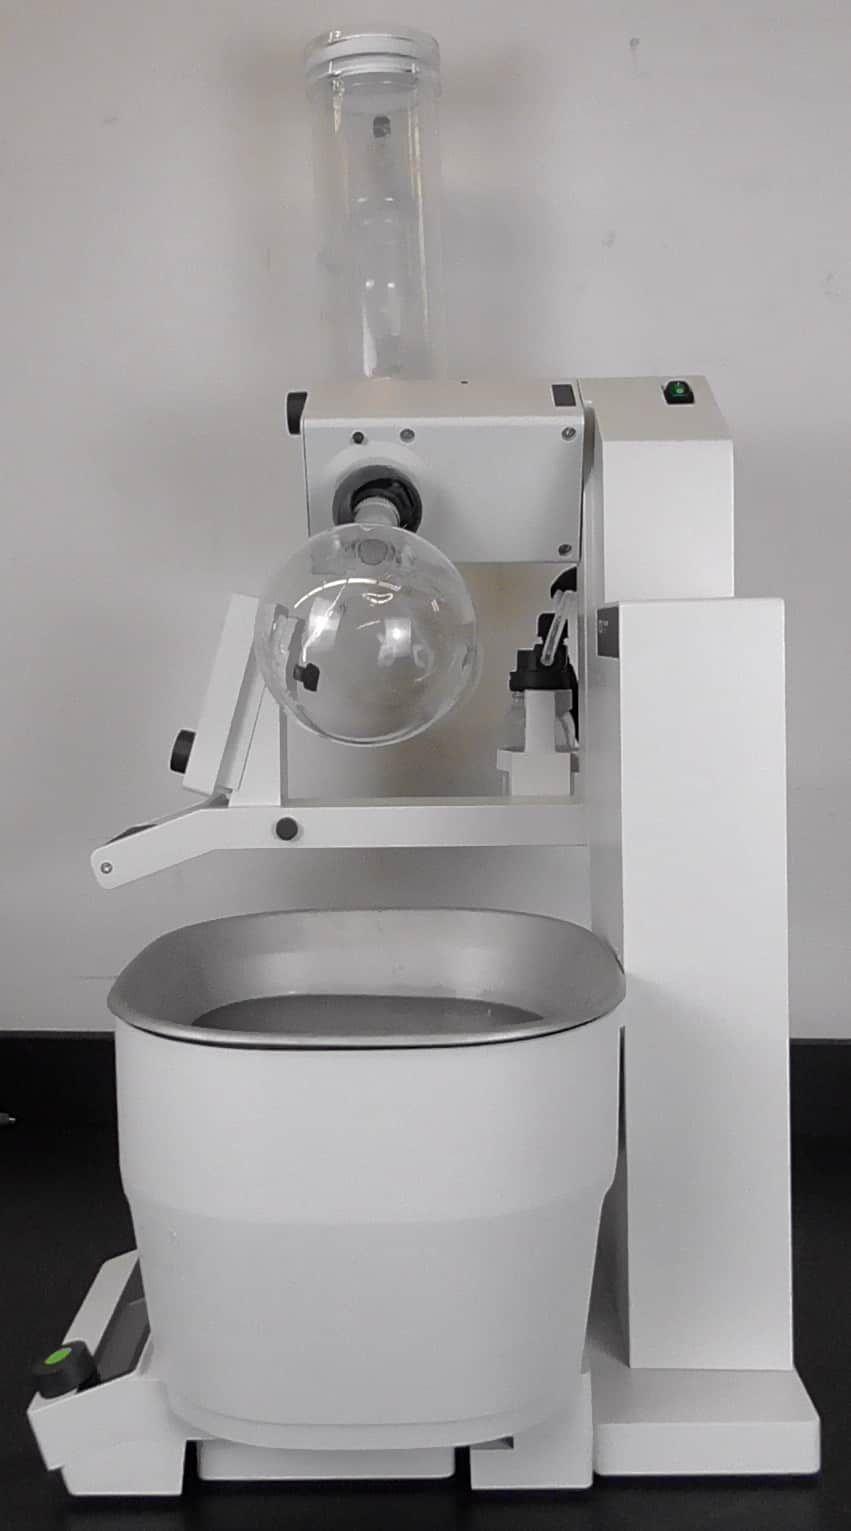 Buchi R-300 Rotary Evaporator with V-300 Vacuum Pump